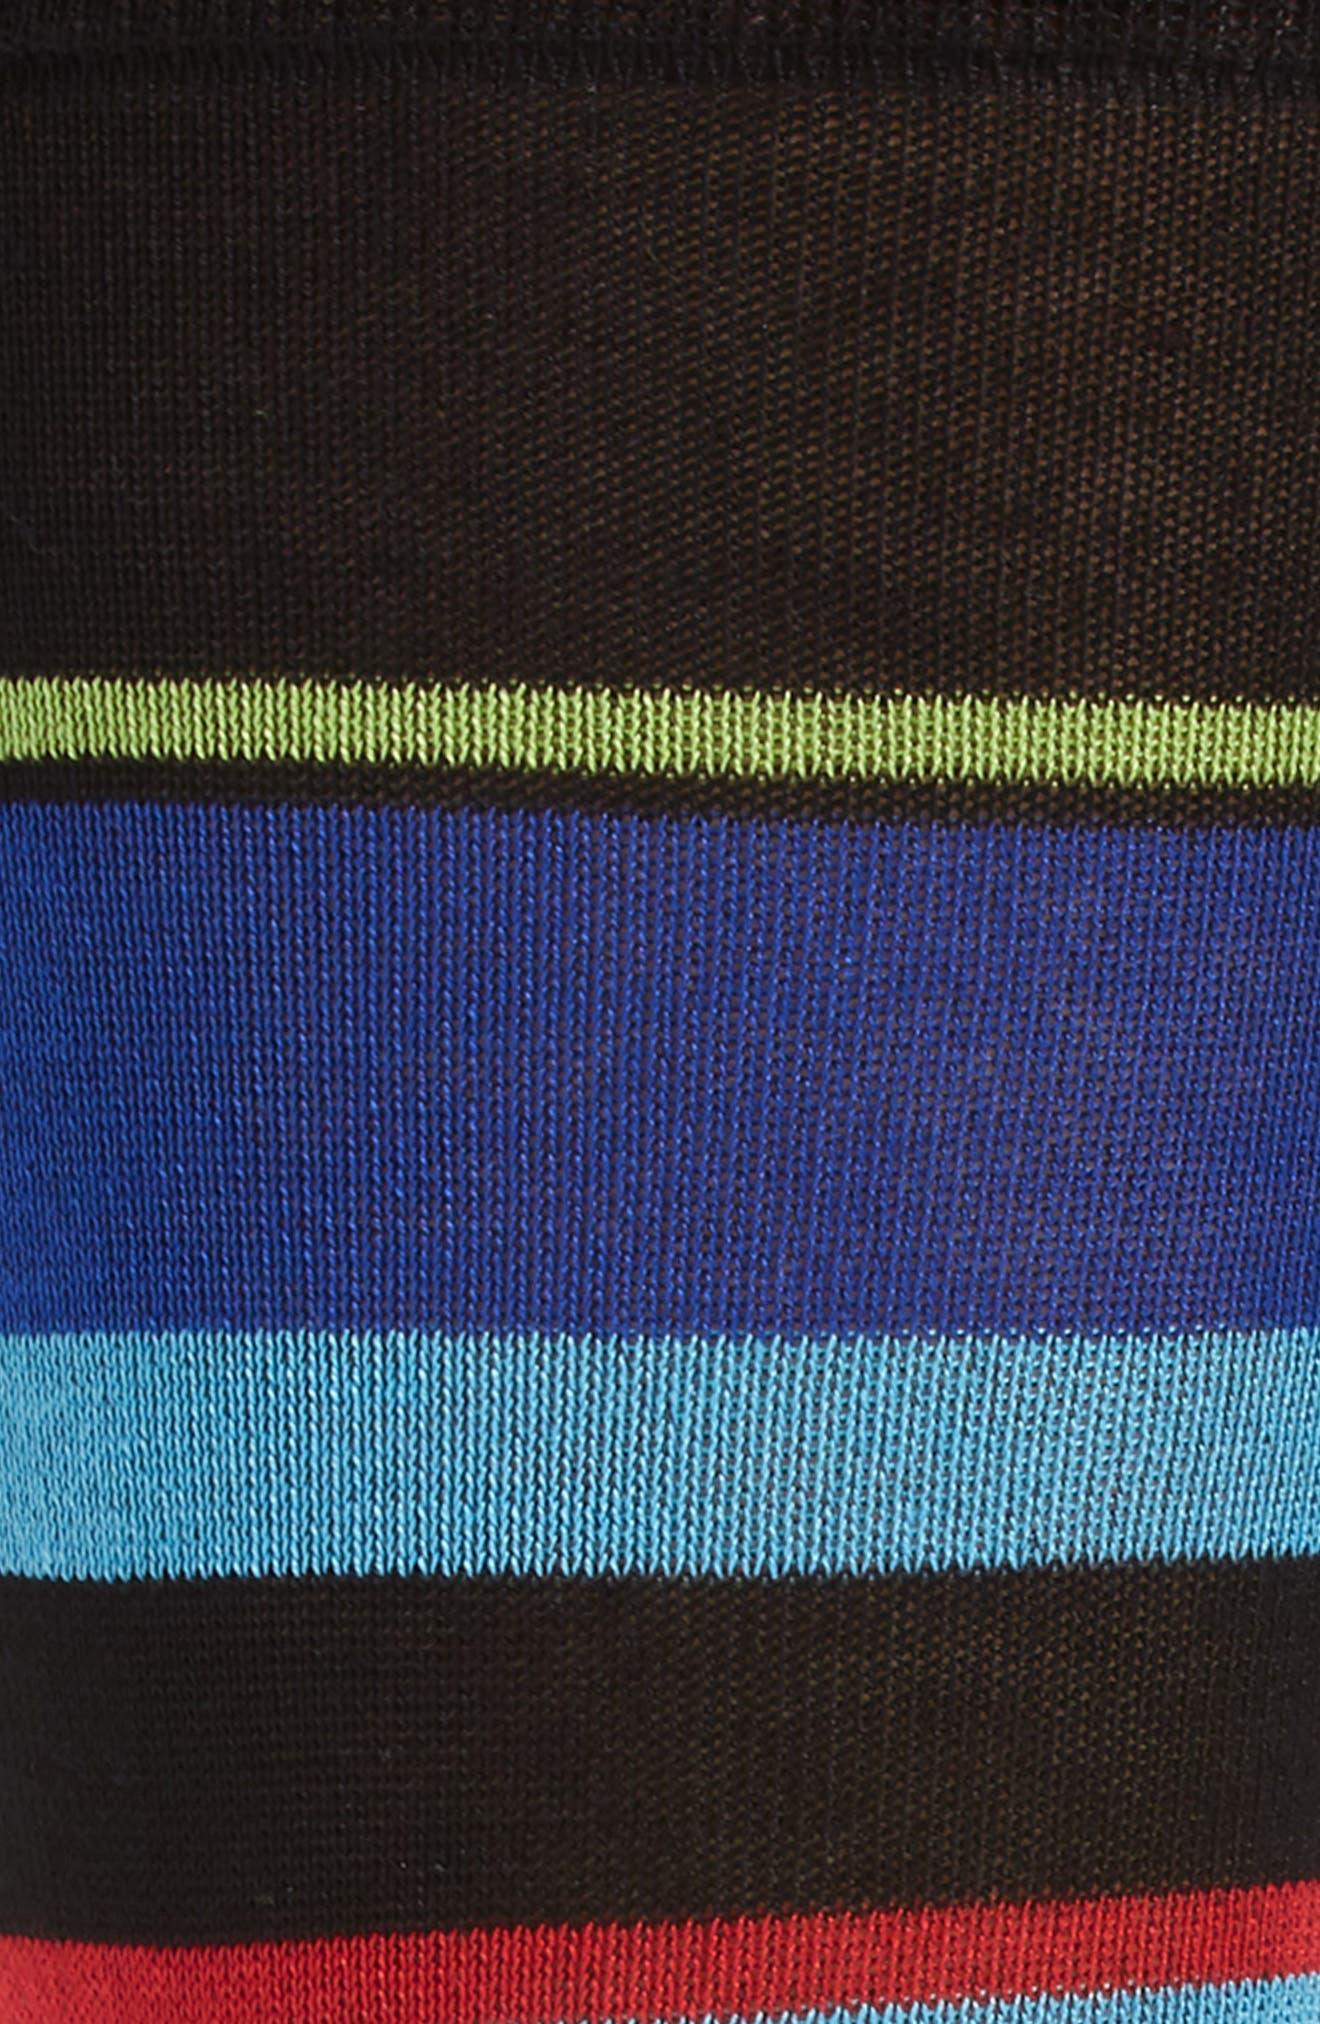 Stripe Mercerized Cotton Blend Socks,                             Alternate thumbnail 3, color,